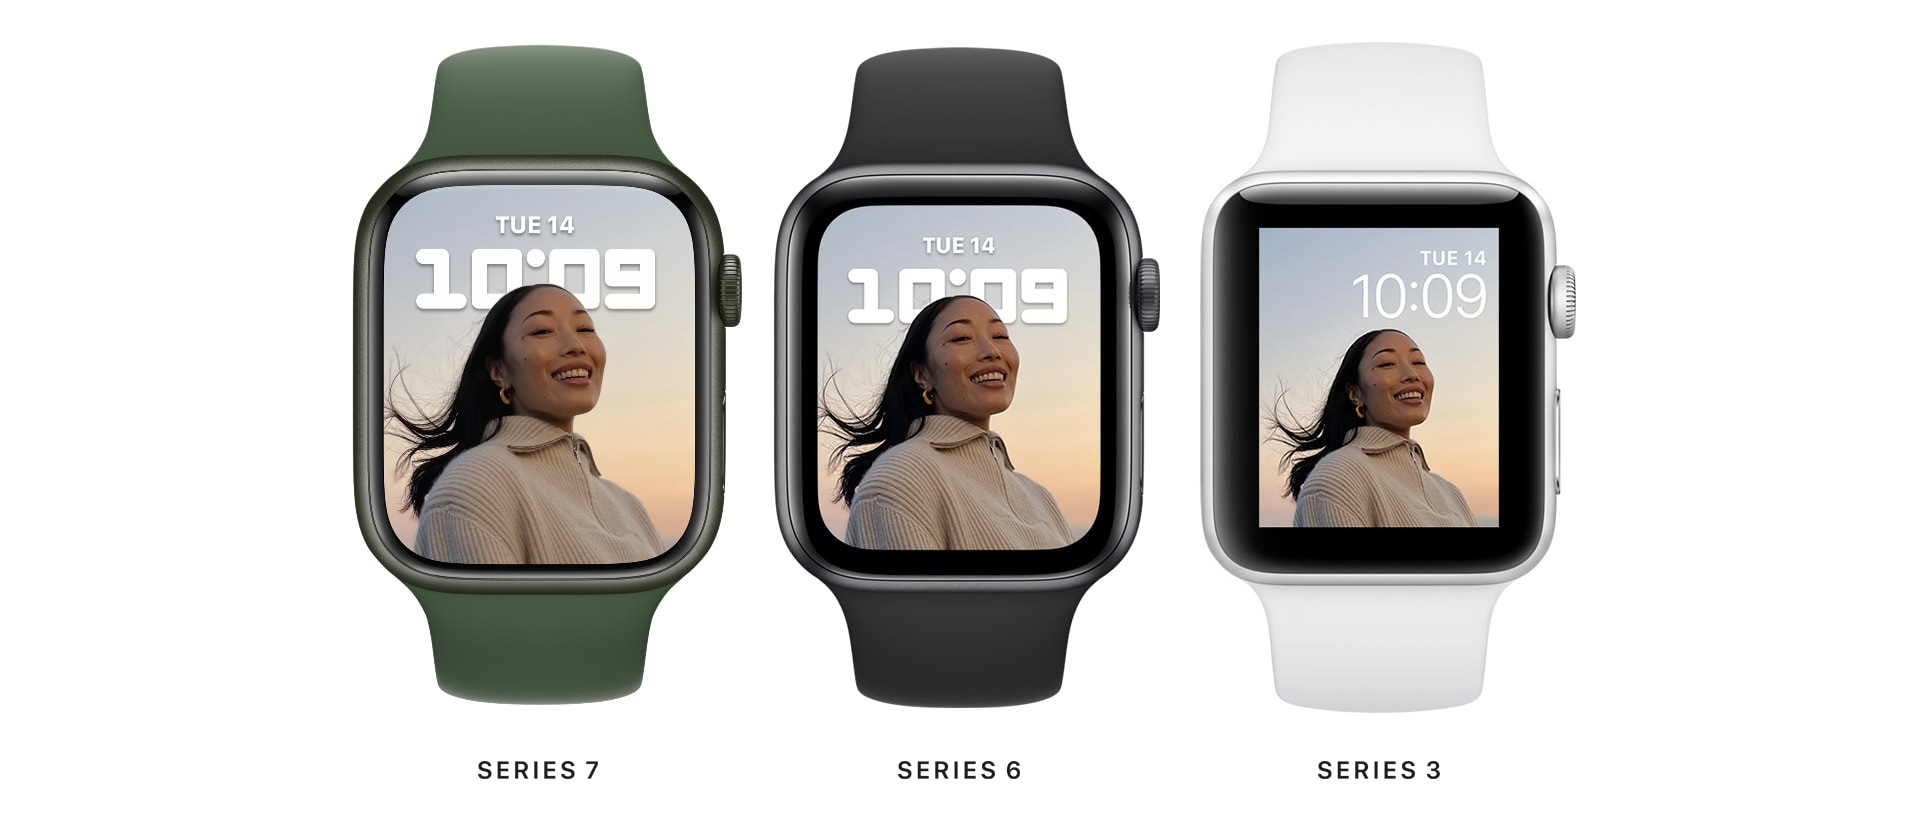 Apple Watch 7: A bigger screen always looks better